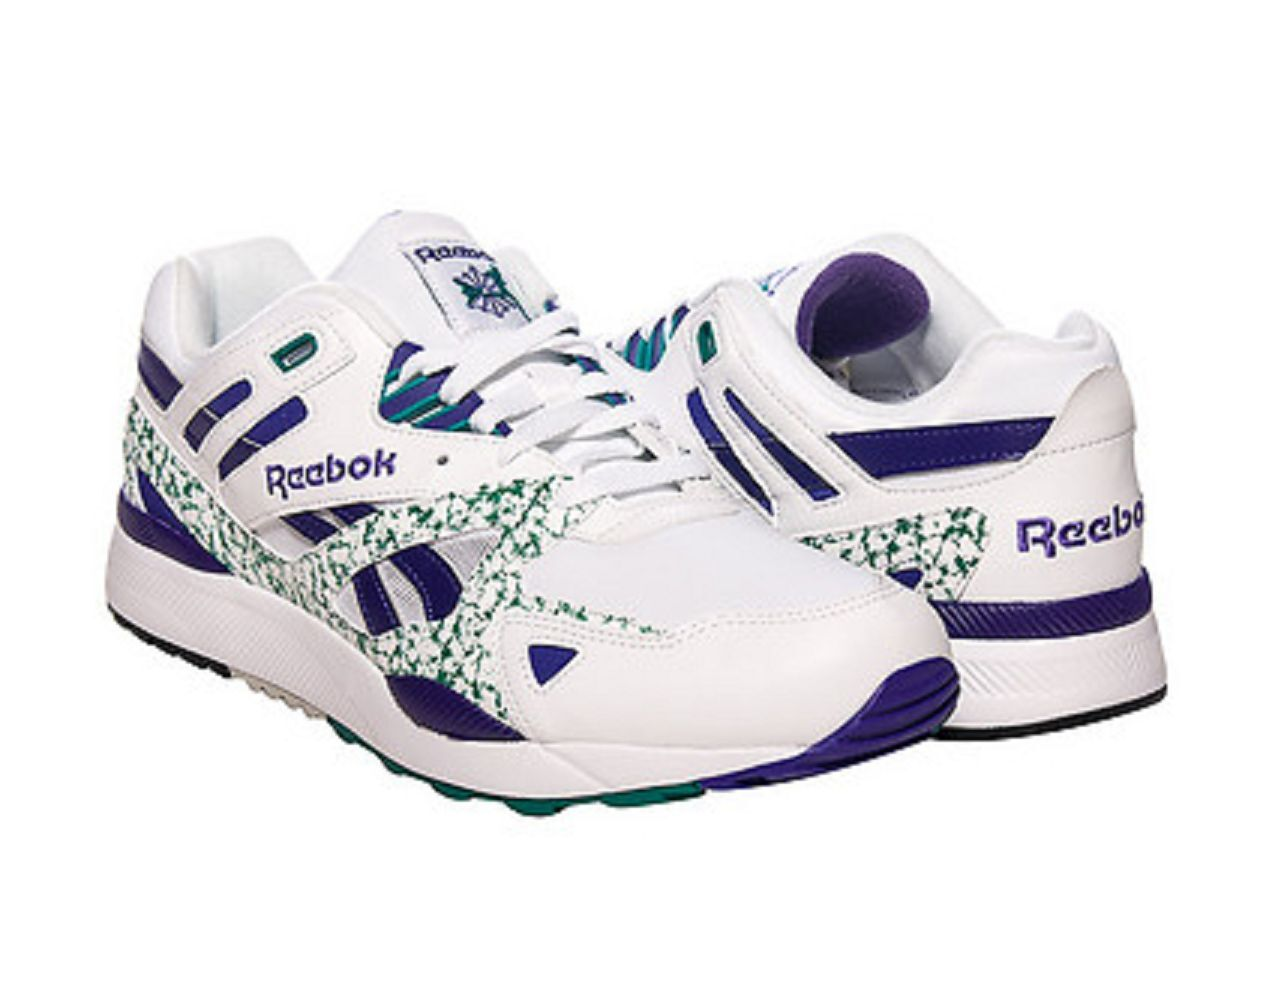 REEBOK M45596 VENTILATOR II Mn's (M) White/Purple Leather Athletic Shoes